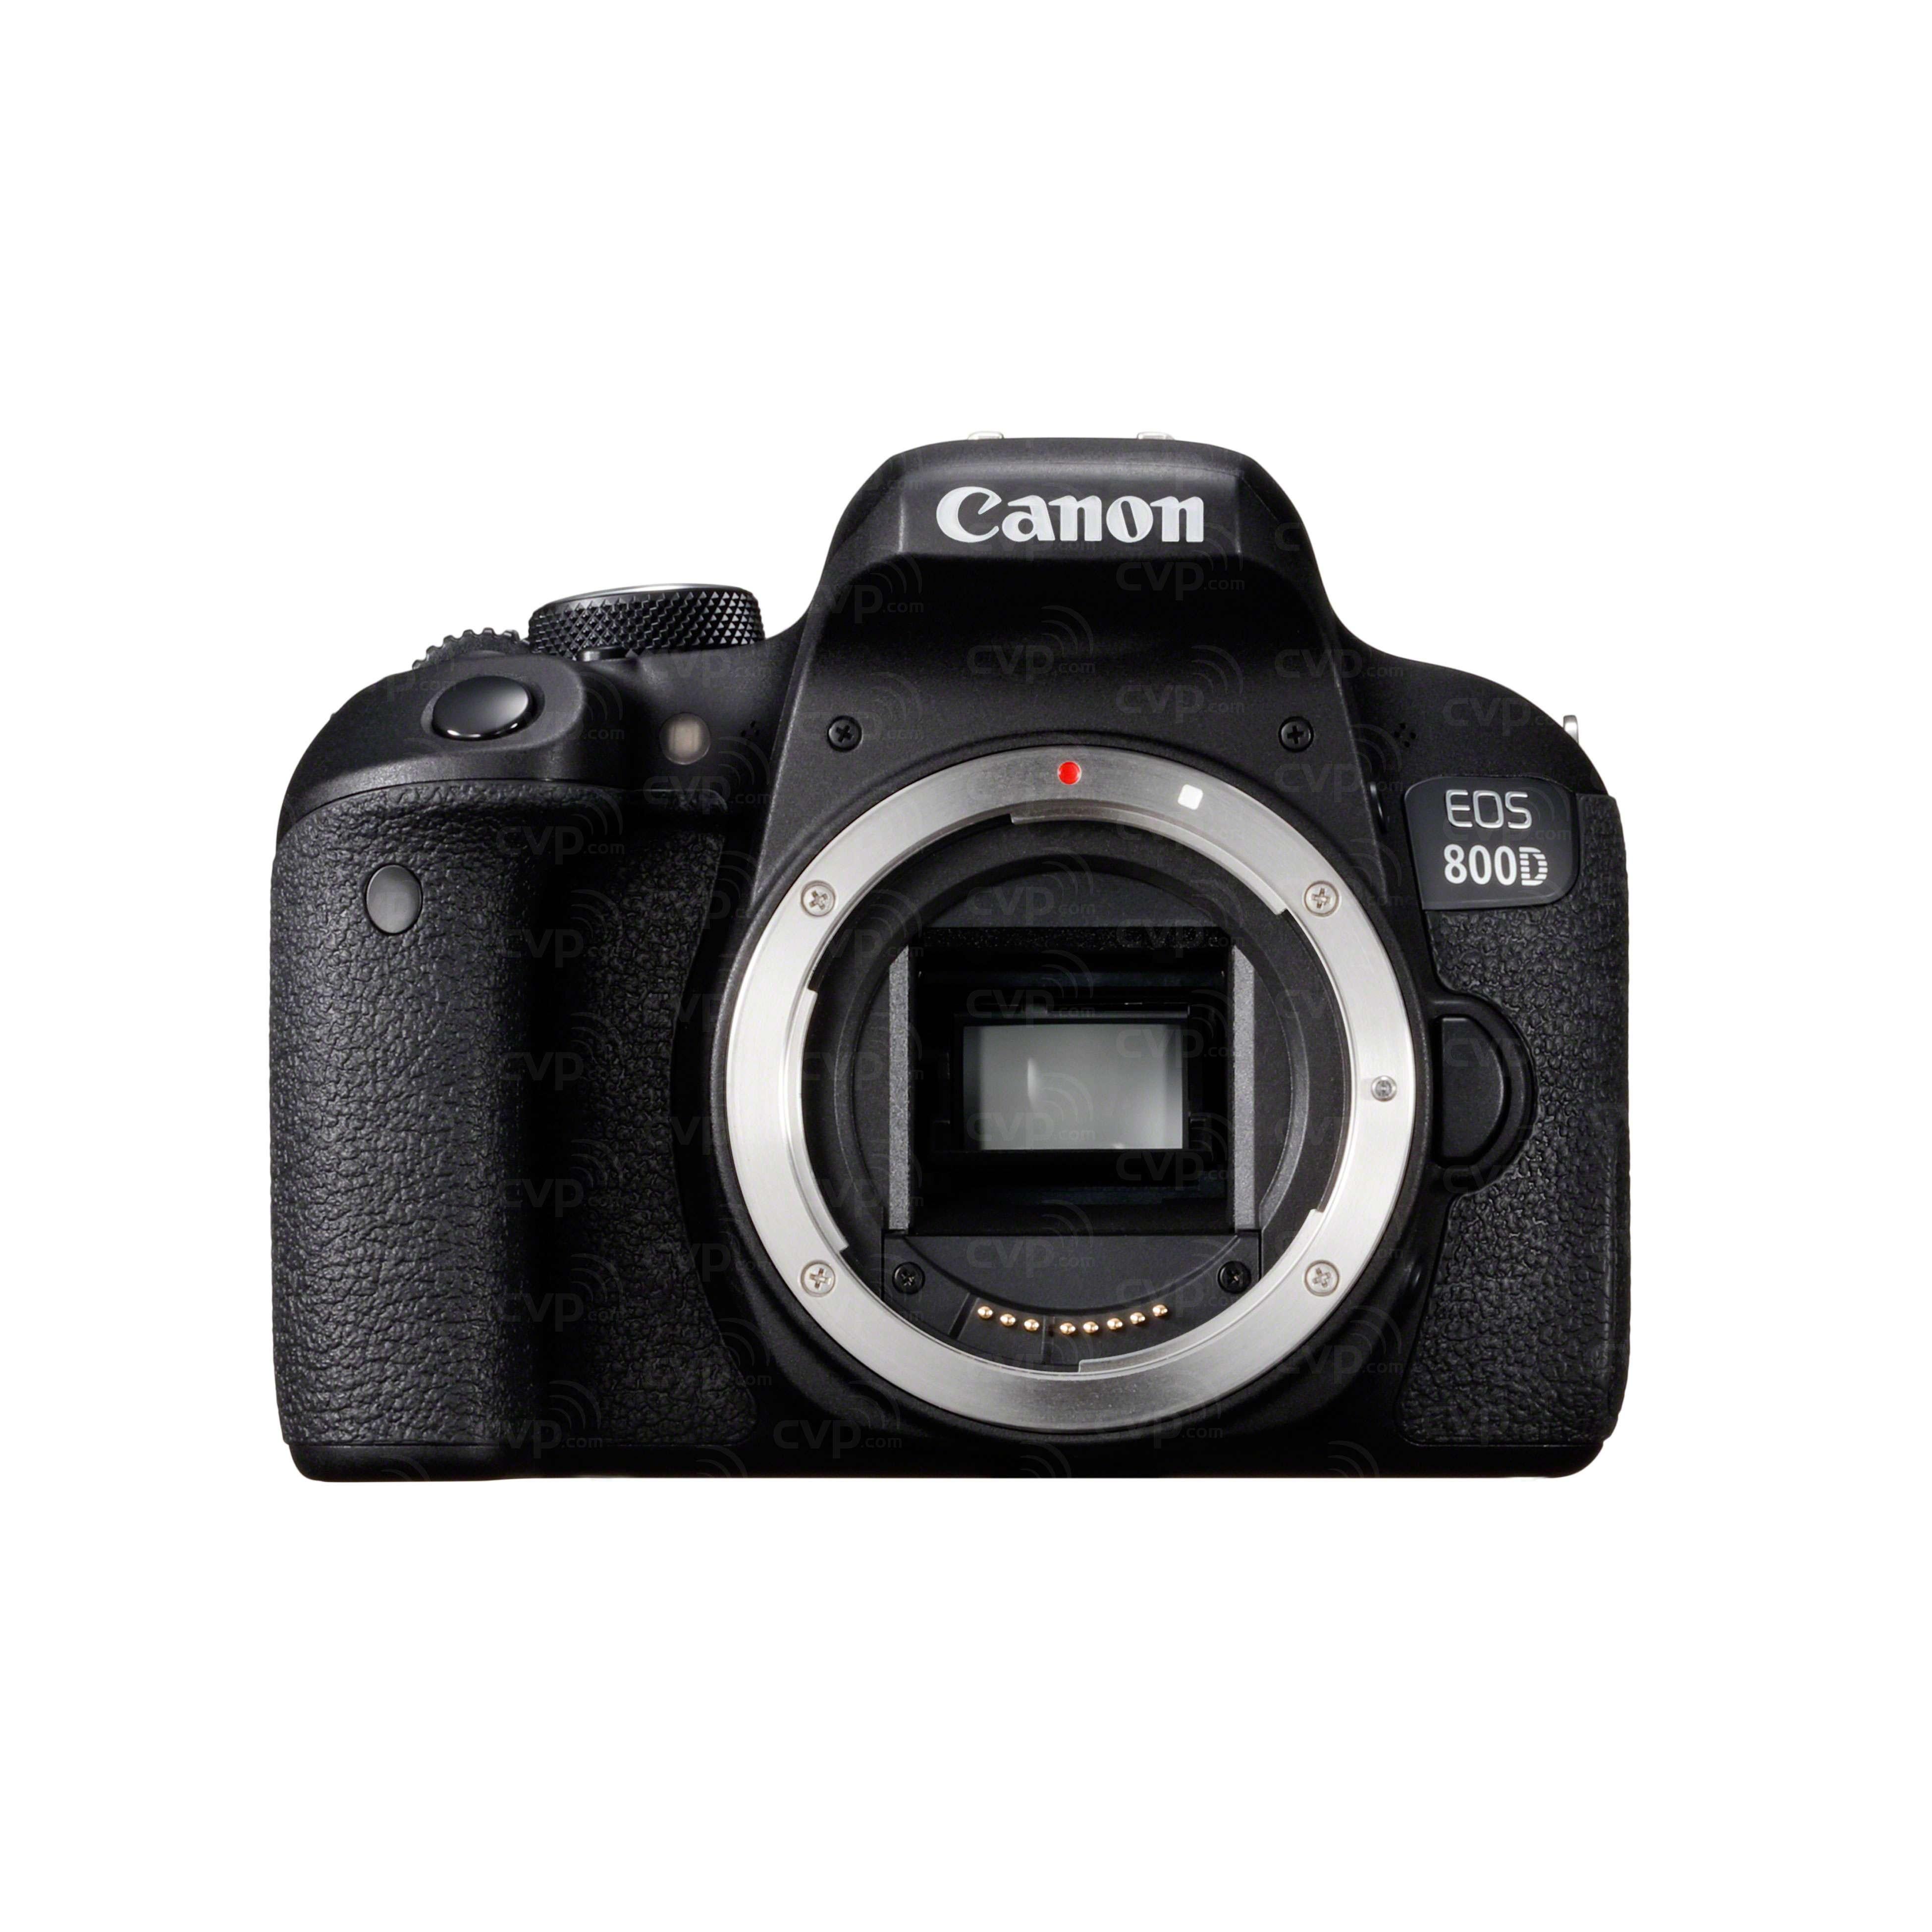 Canon EOS 800D 24.2MP Full HD Digital SLR Camera Body